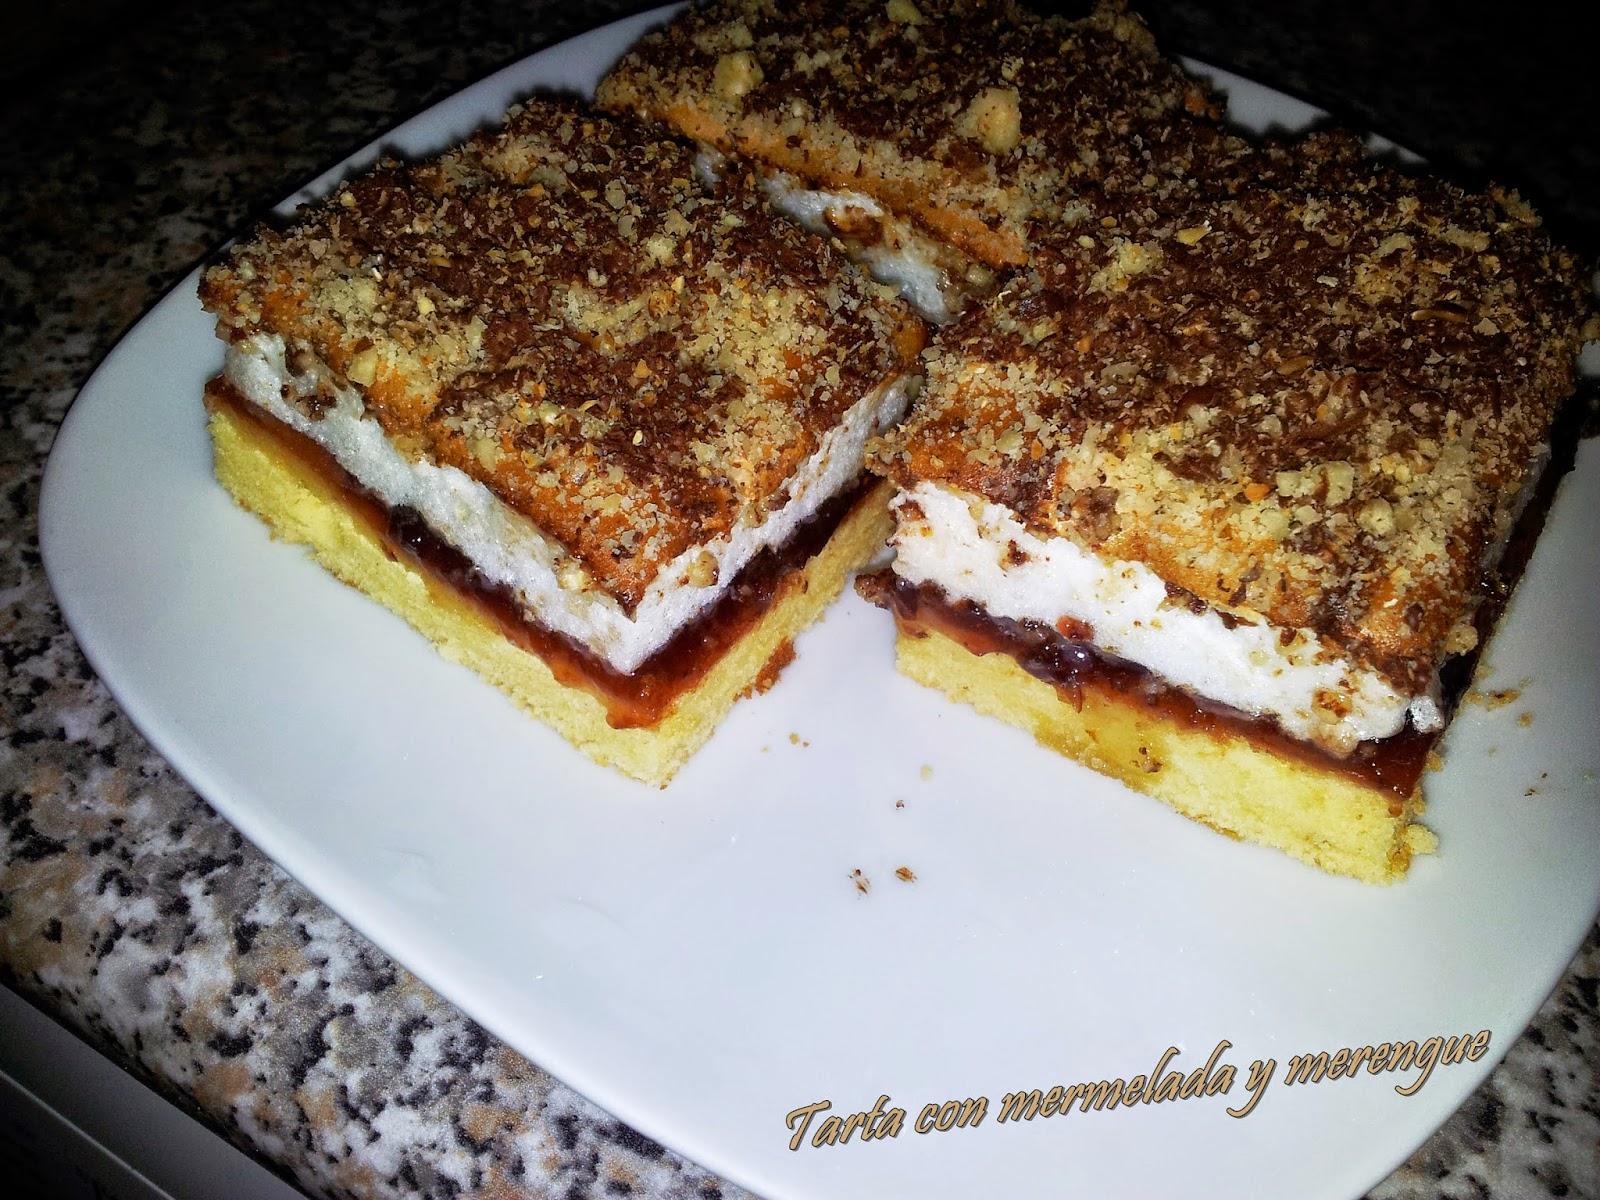 Tarta con mermelada y merengue